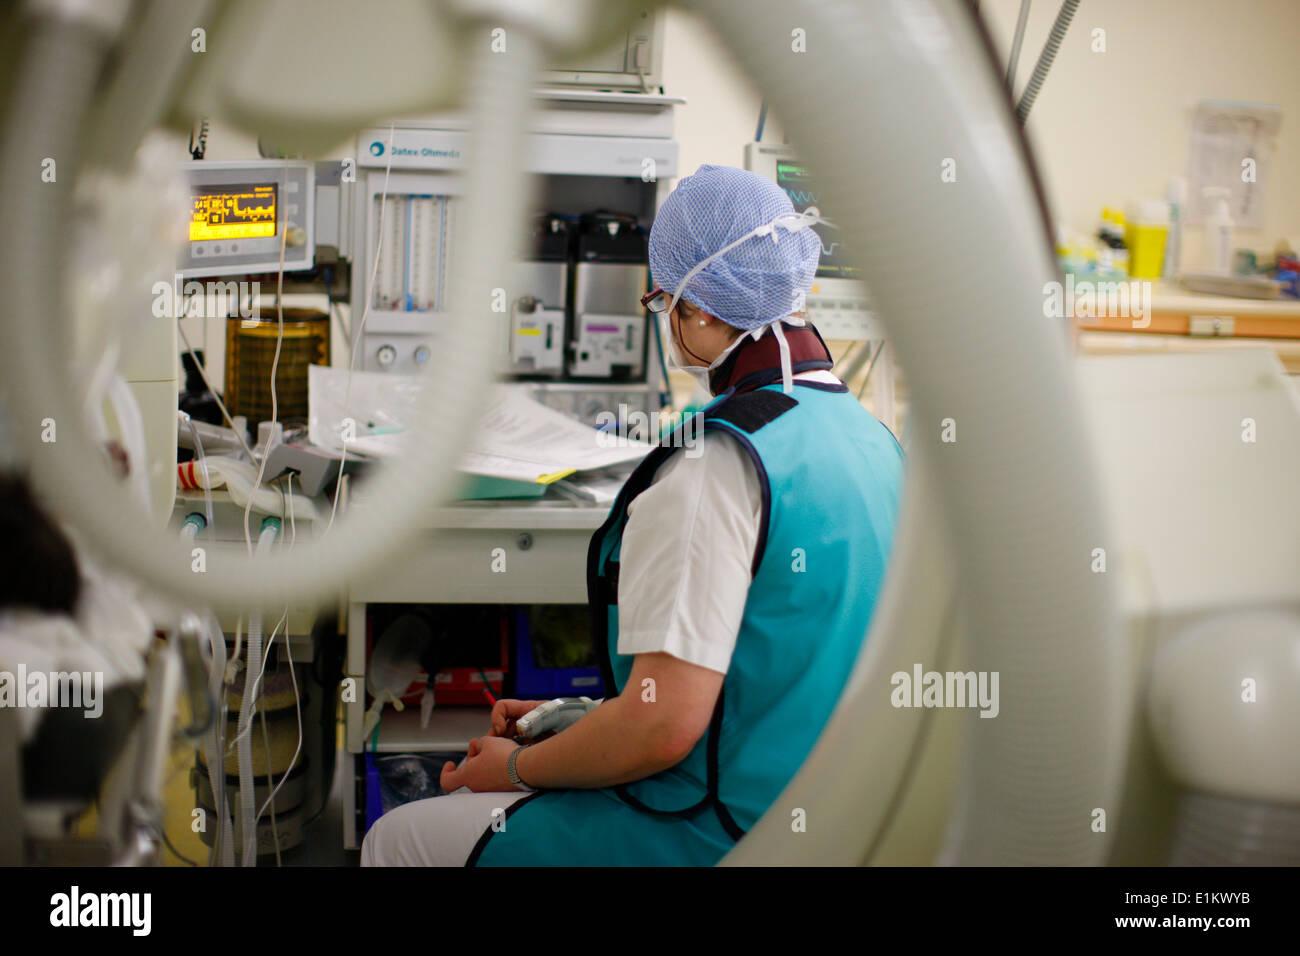 Cardiac surgery - Anesthesiologist - Stock Image